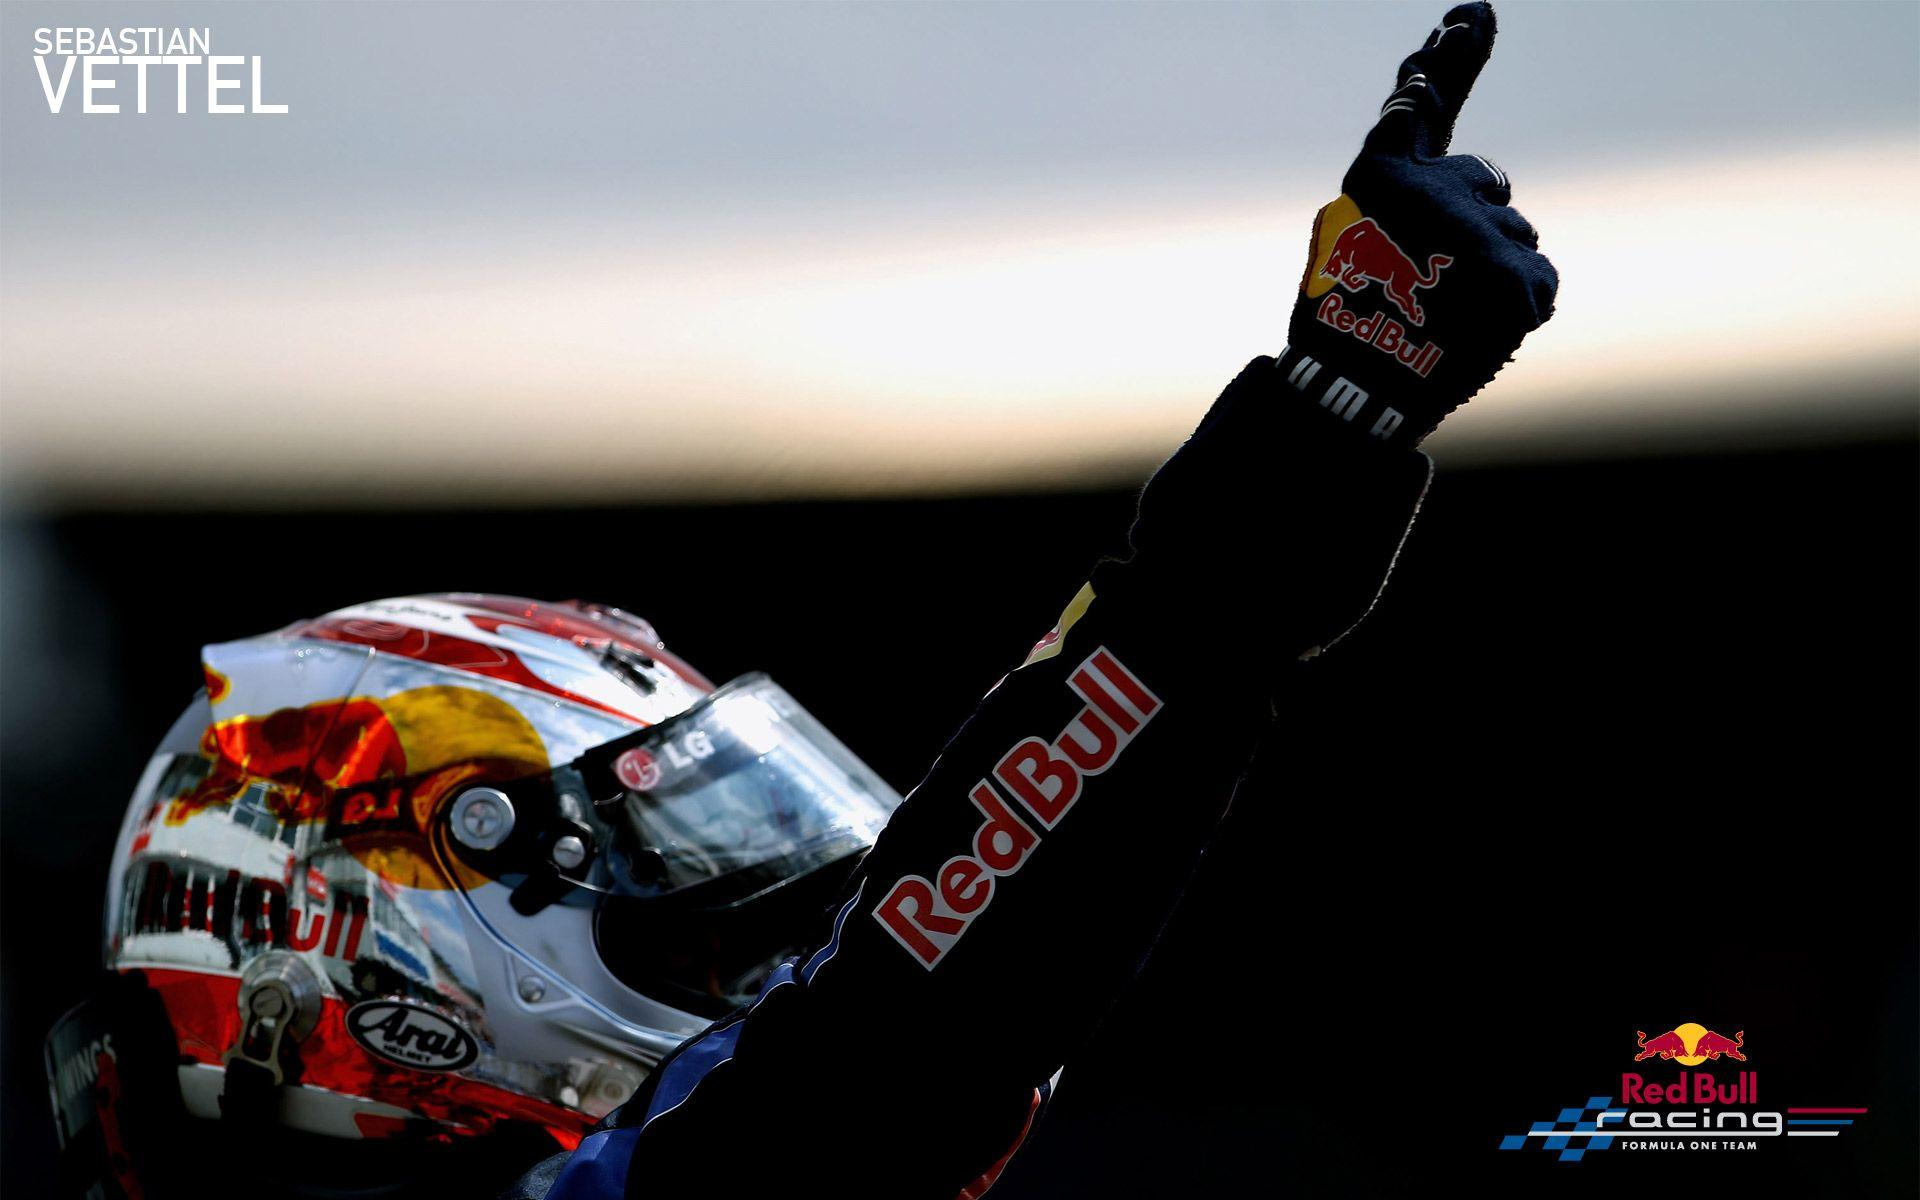 77 Red Bull Backgrounds On Wallpapersafari: Red Bull Racing Wallpapers